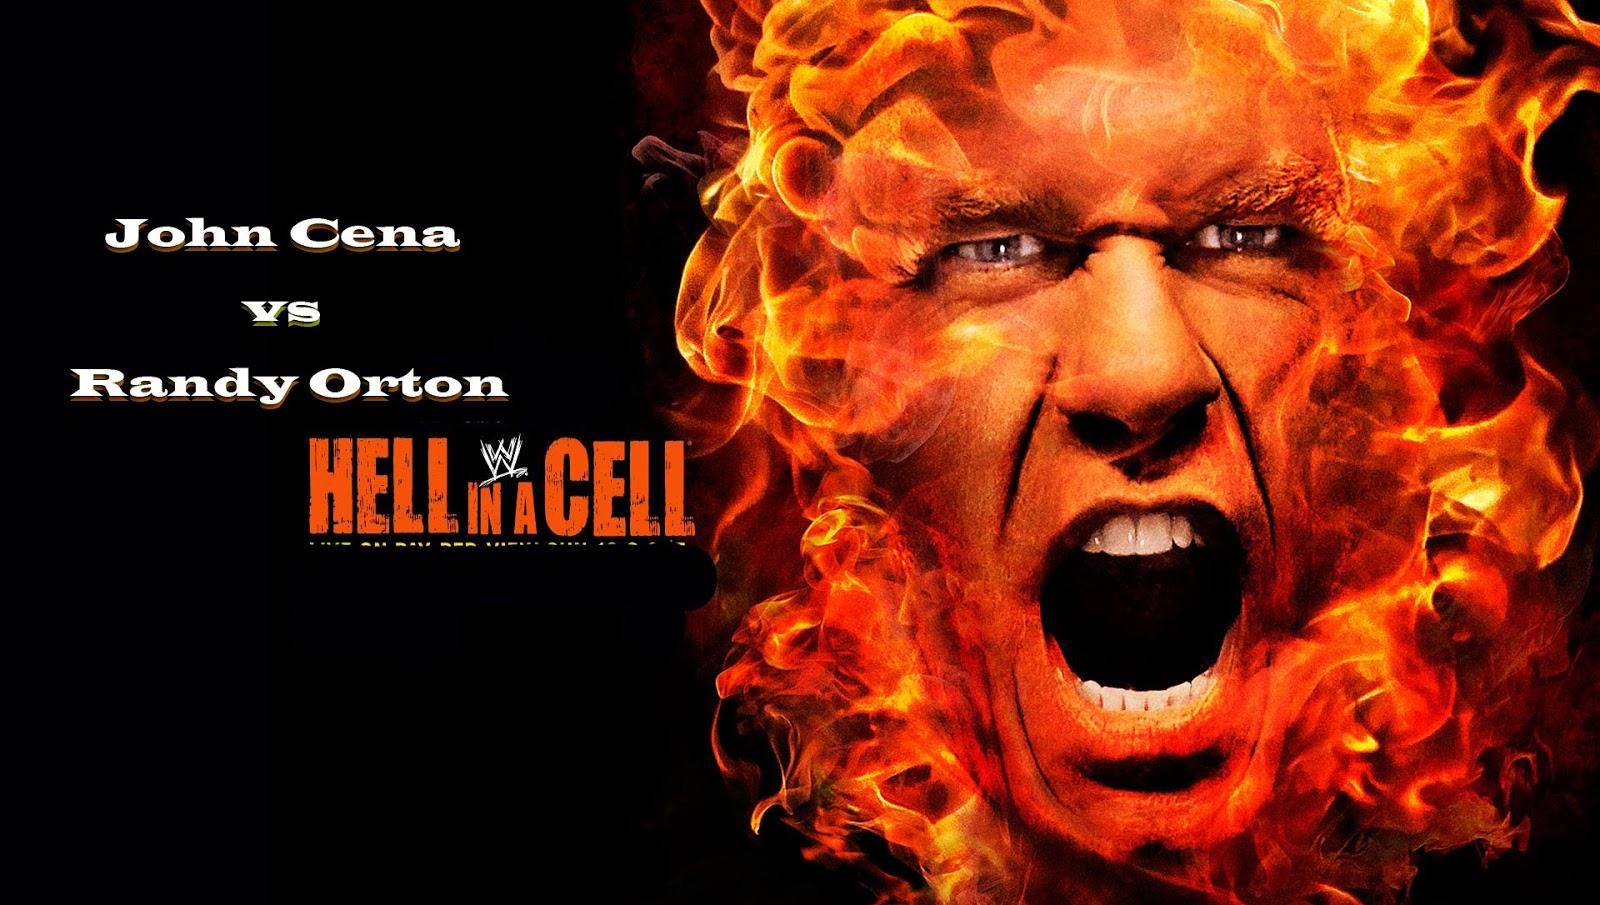 John Cena  Wallppers Vs Randy Orton Hell in a Cell Match HD